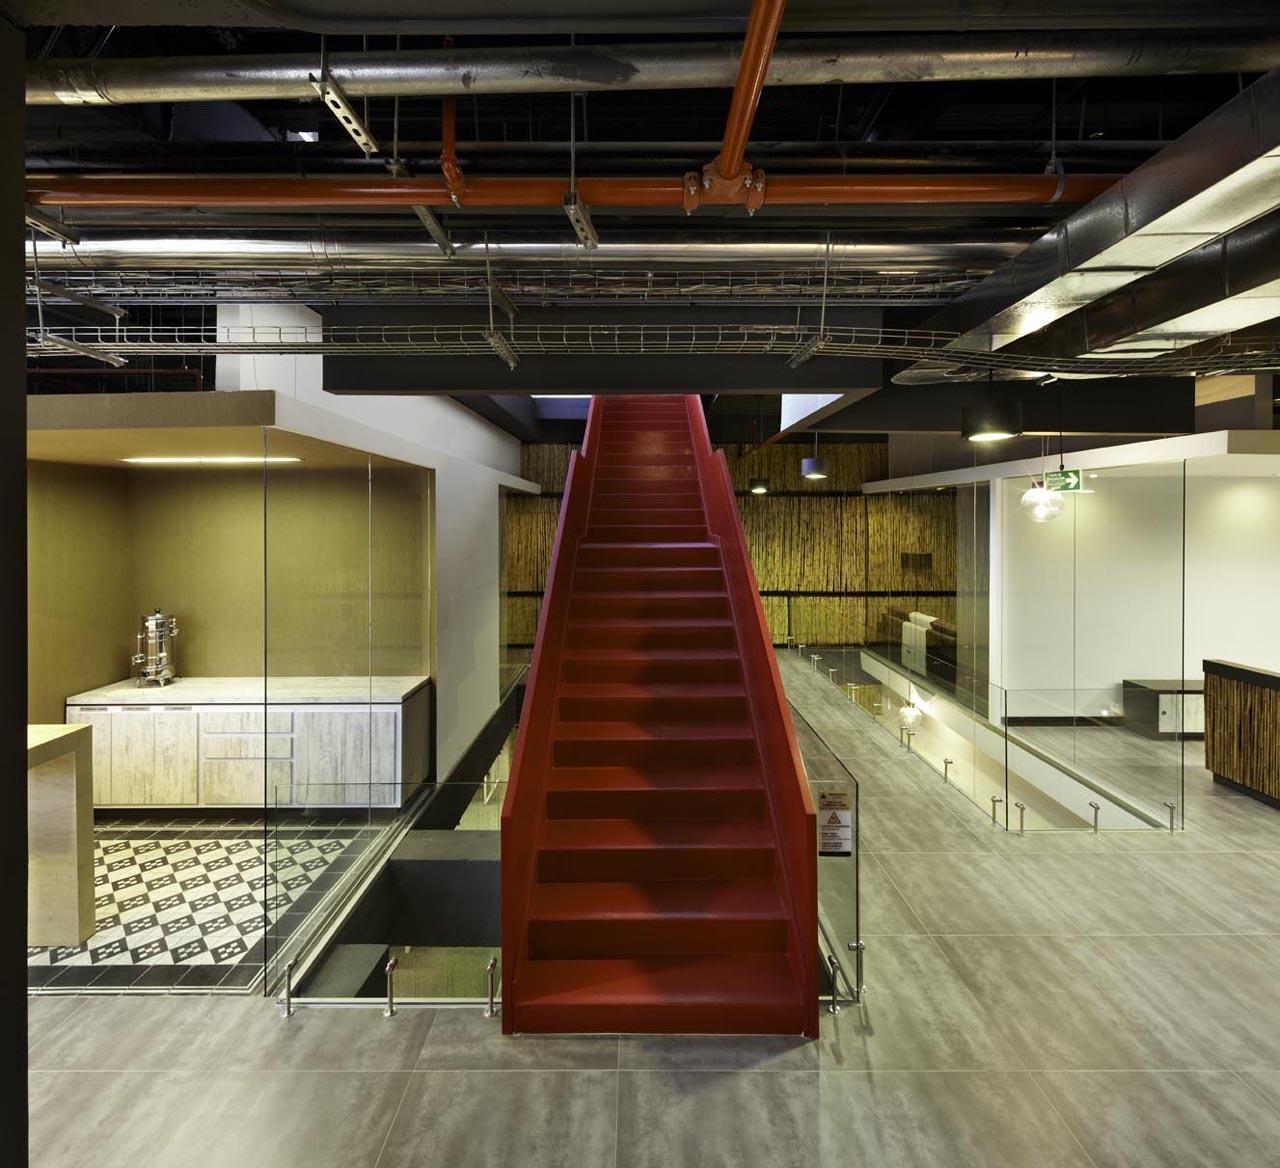 Jwt bogotá headquarters by aei arquitectura e interiores karmatrendz